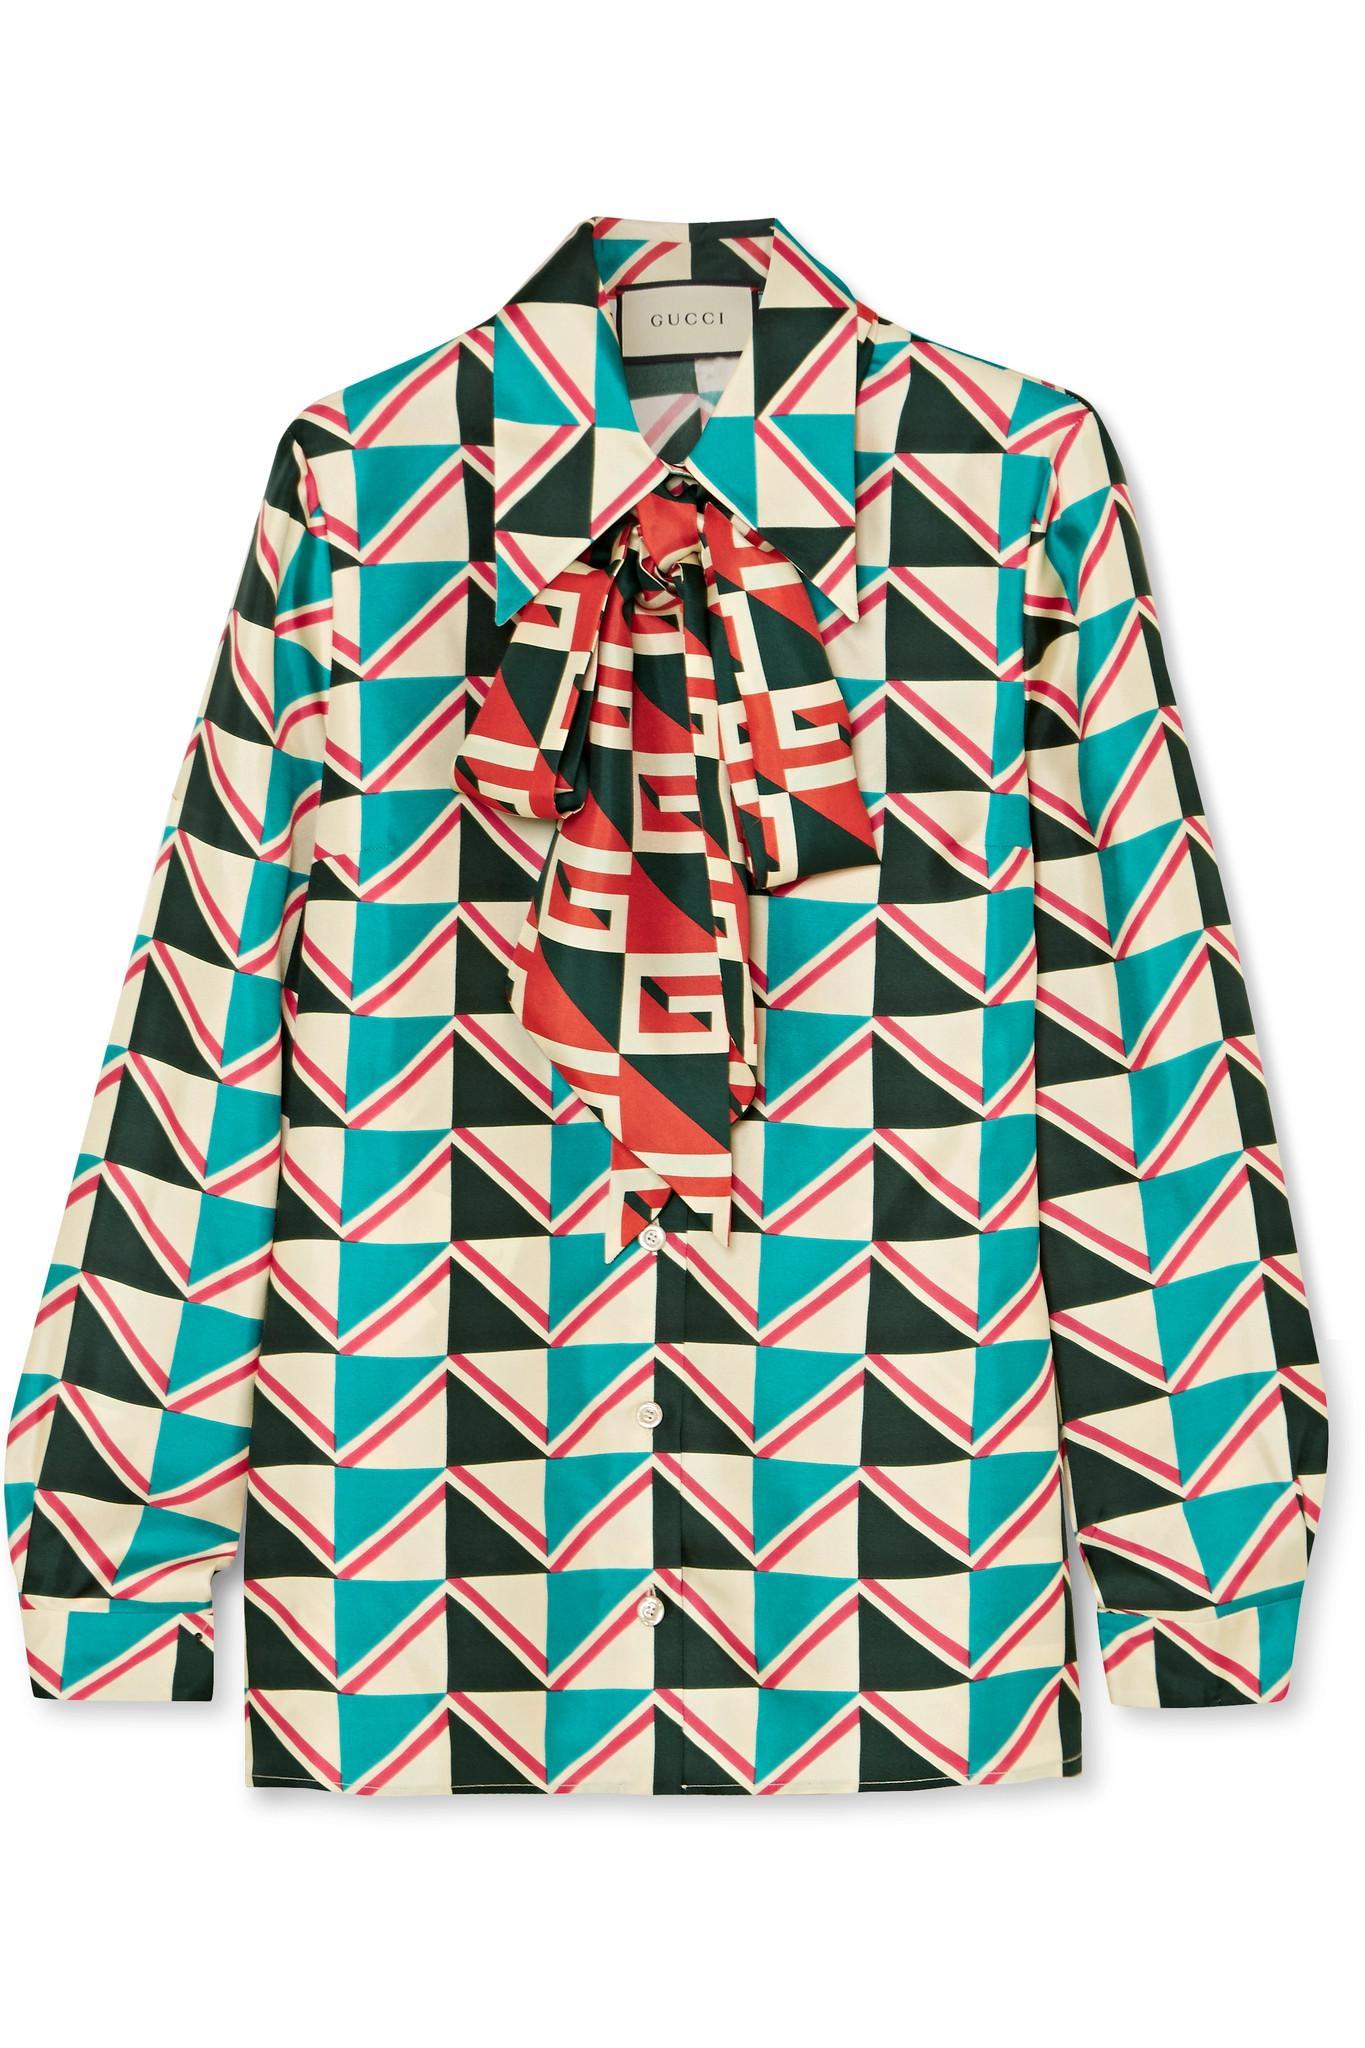 c2cd60af34d Gucci - Green Pussy-bow Printed Silk-twill Shirt - Lyst. View fullscreen